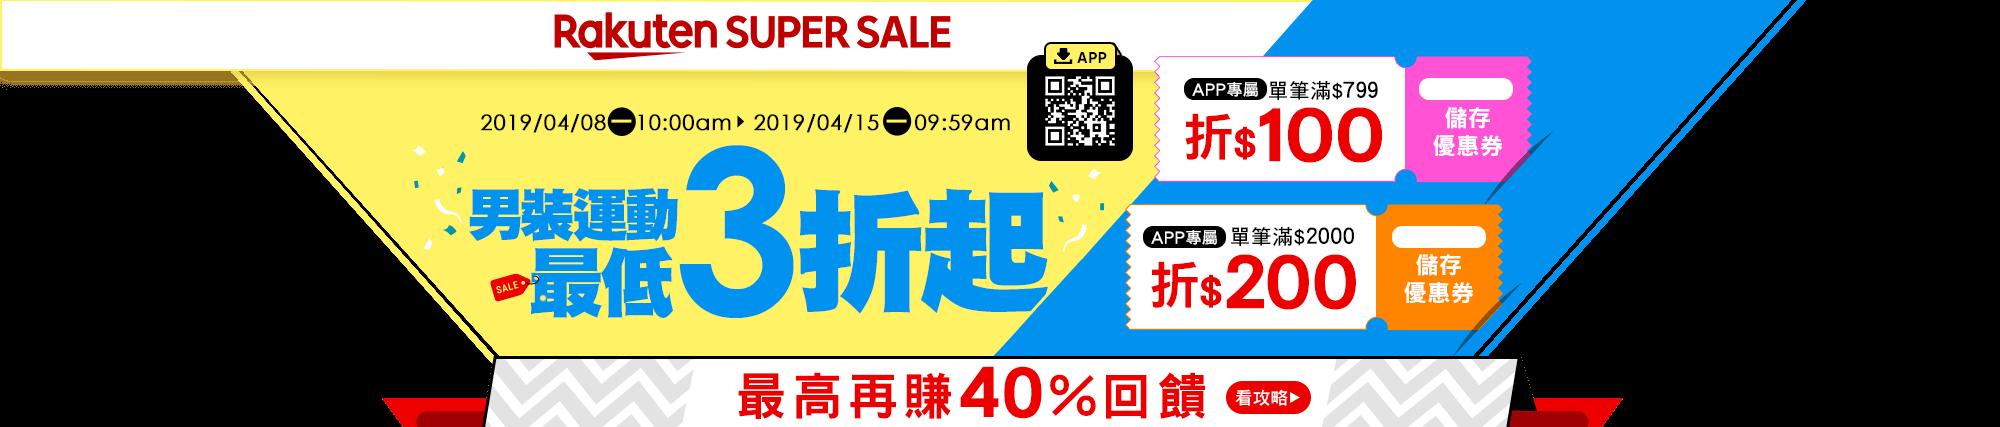 SUPER SALE超級特賣週:男裝運動、男鞋最低3折起,最高再賺40%點數回饋